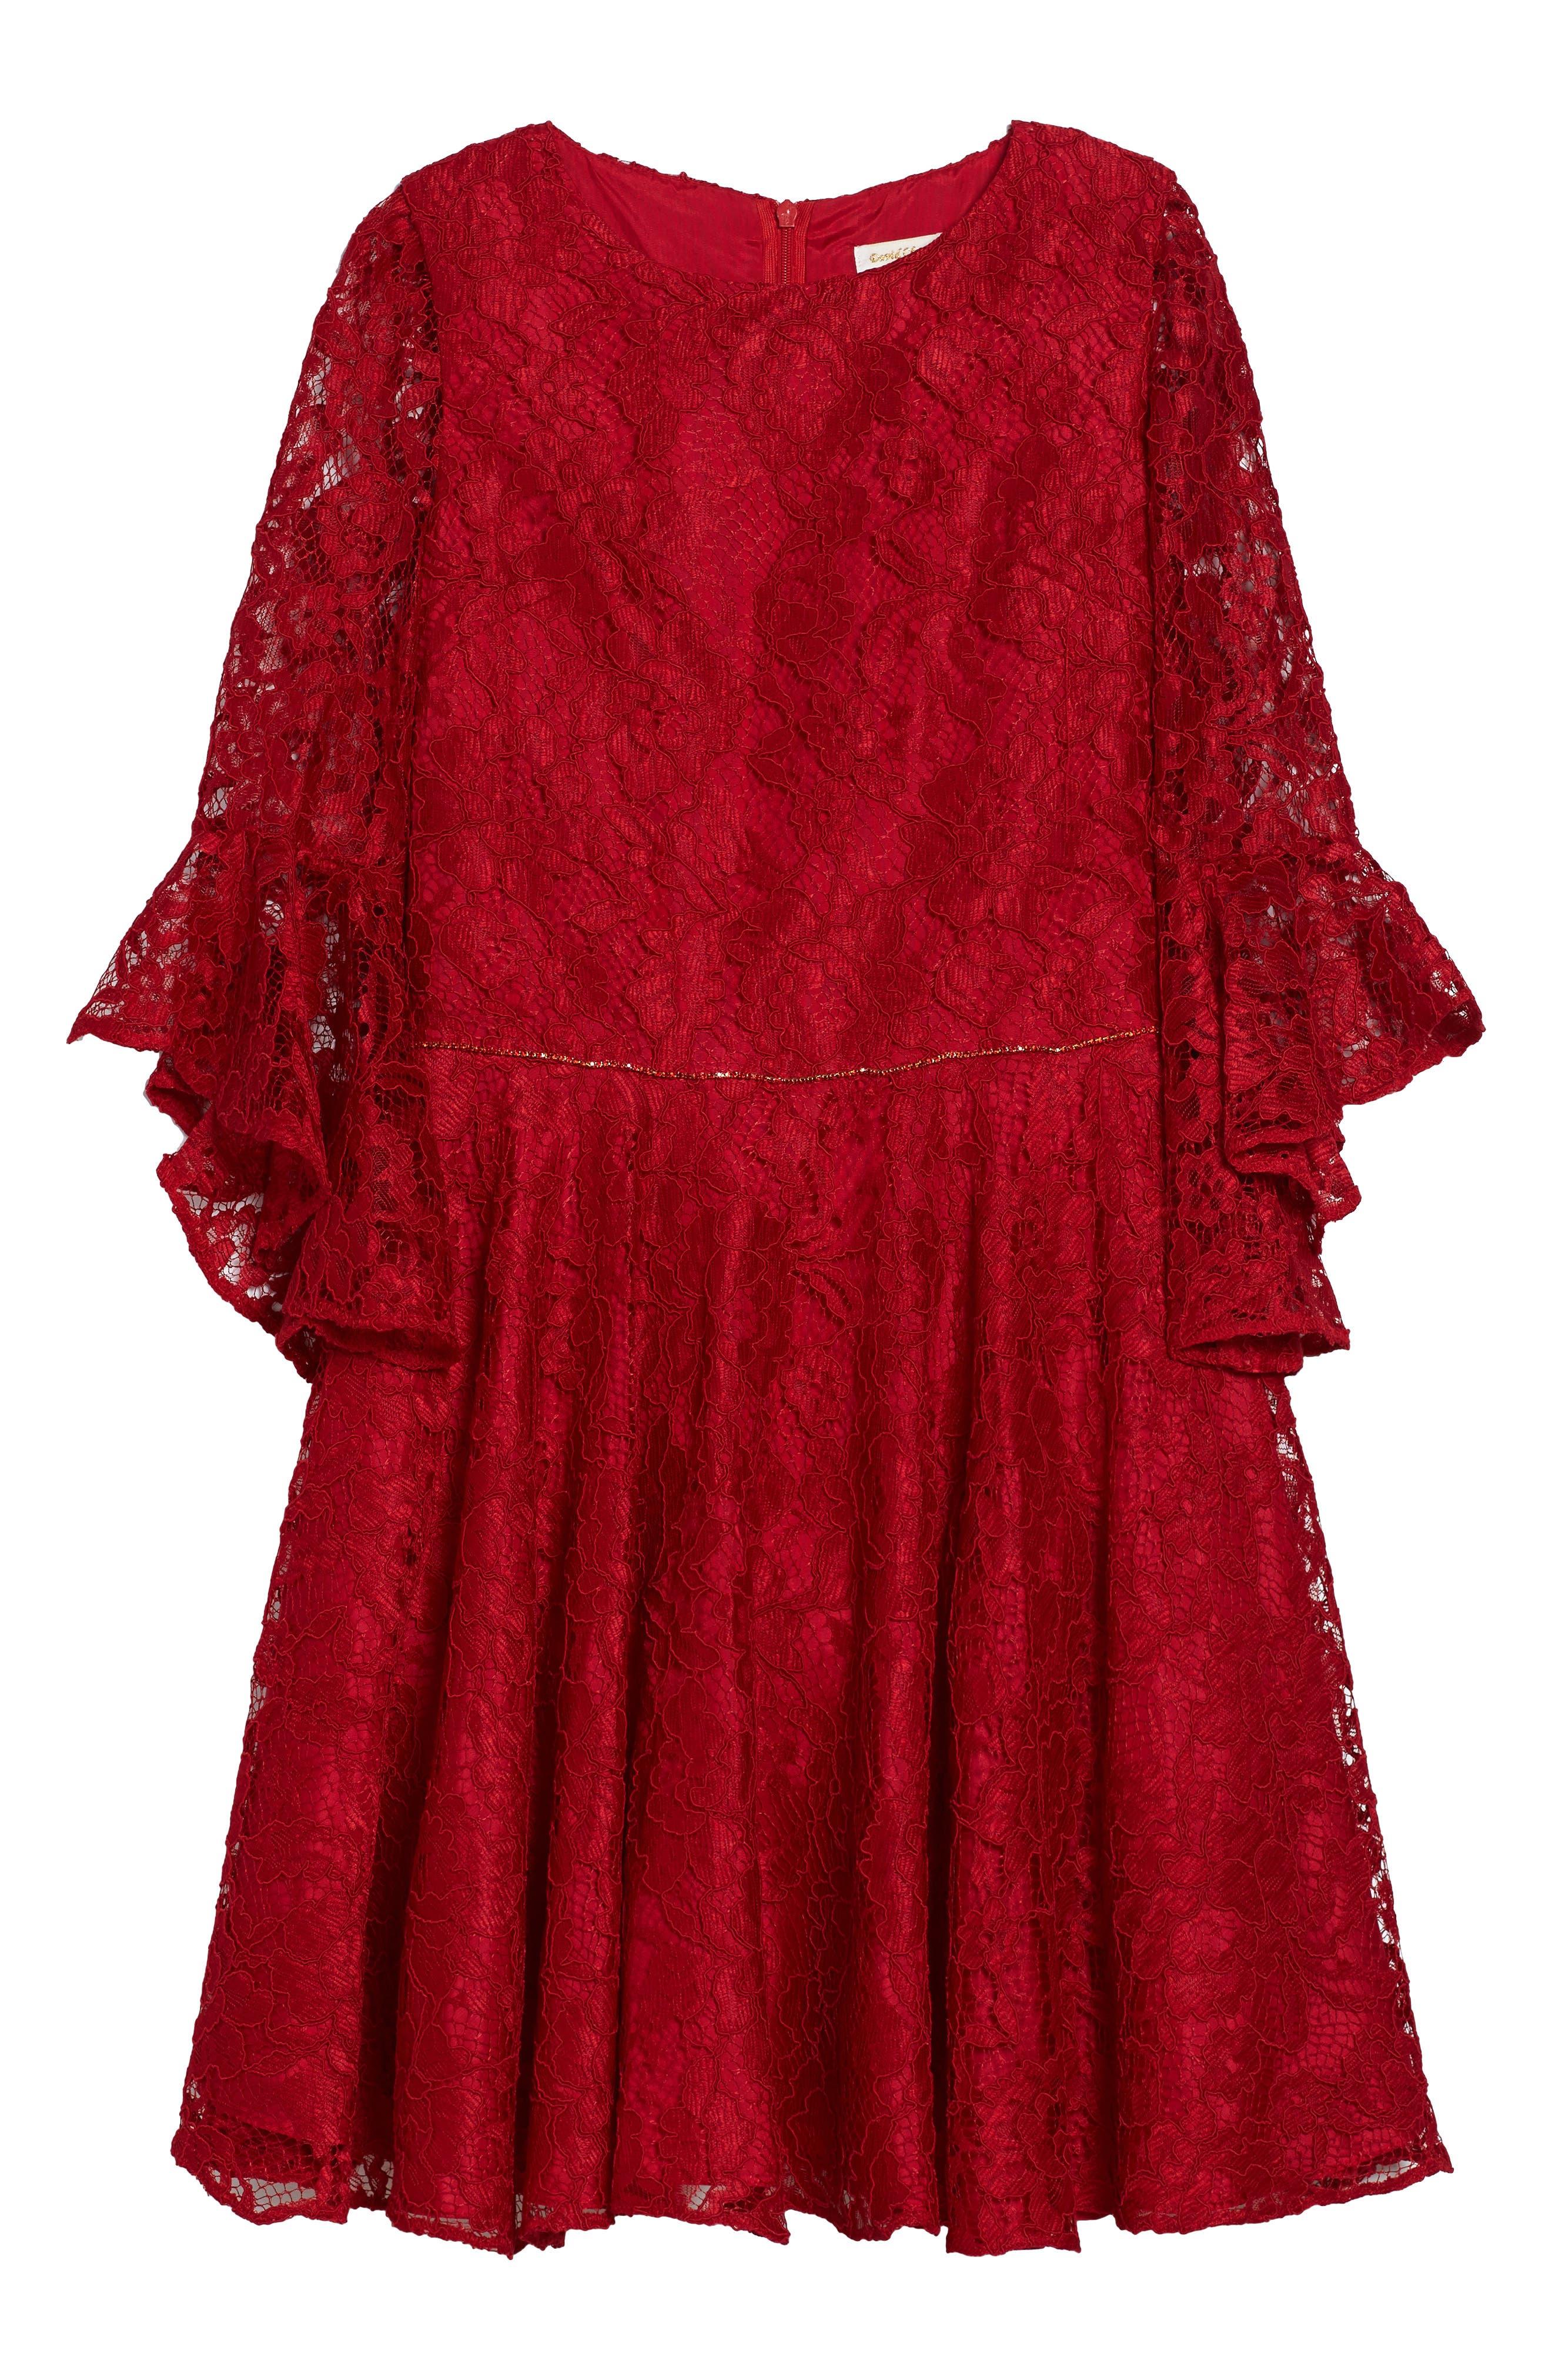 Alternate Image 1 Selected - David Charles Bell Sleeve Lace Dress (Big Girls)